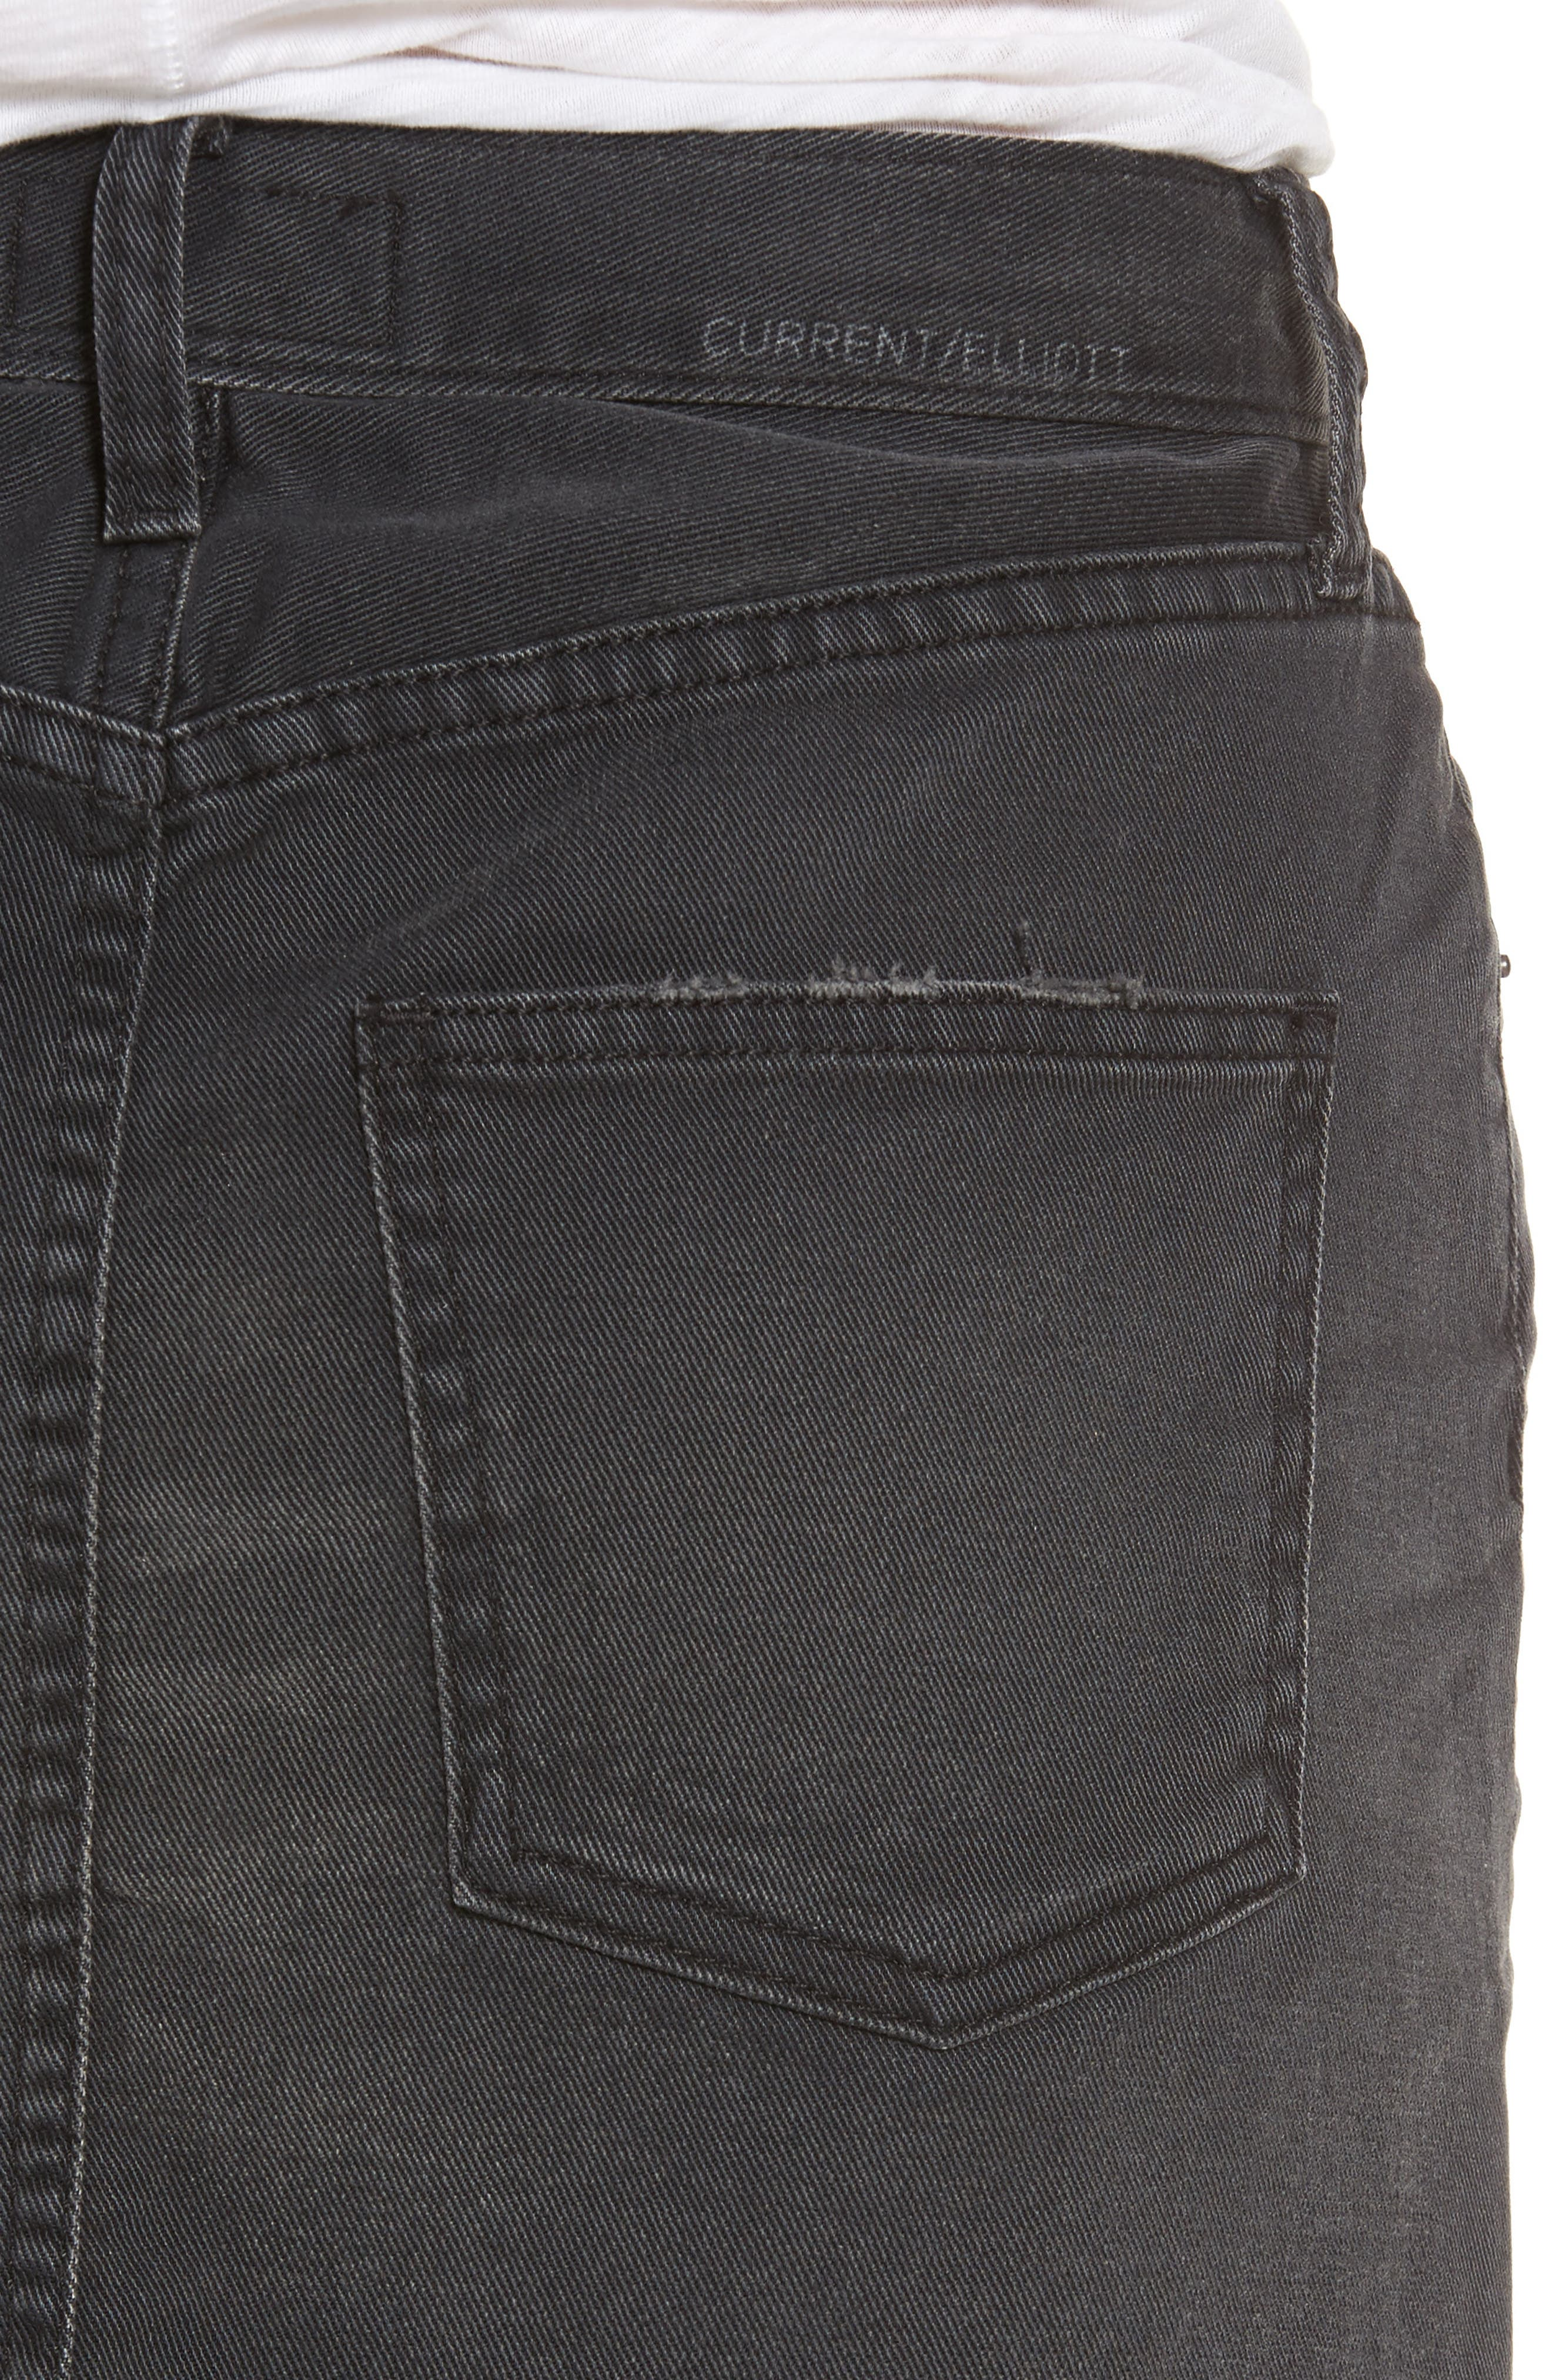 Alternate Image 4  - Current/Elliott Cut Off Miniskirt